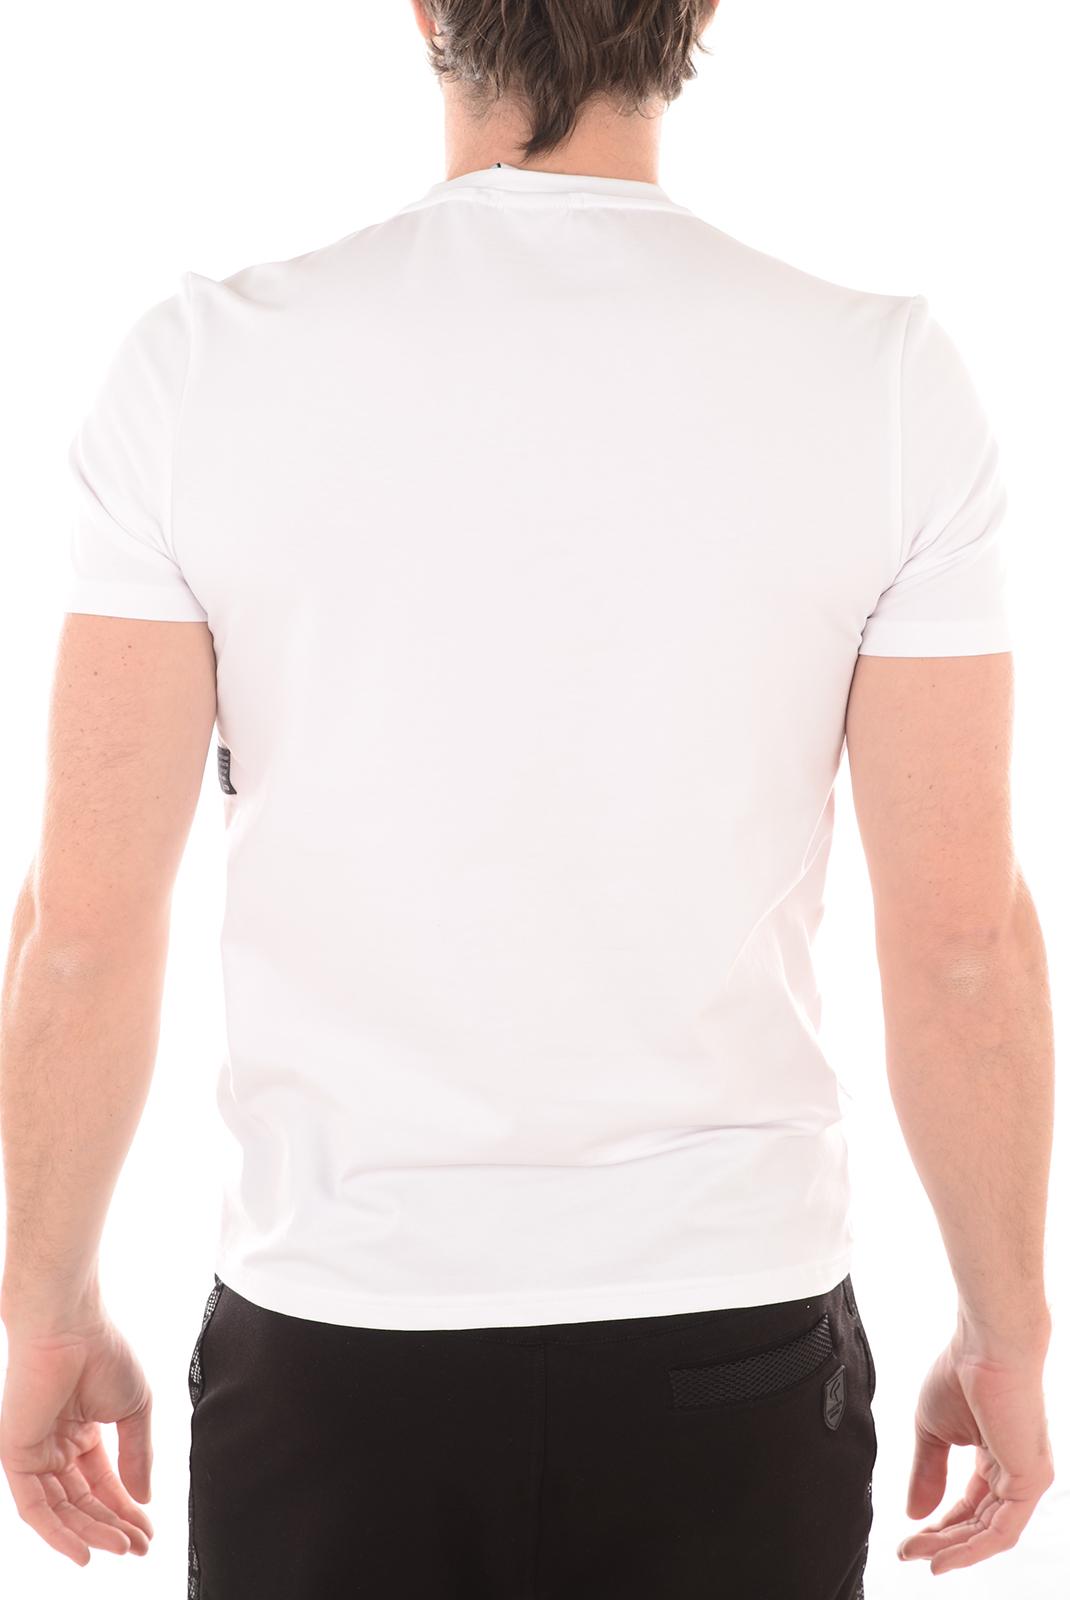 Tee-shirts  Redskins THIMO WORNER WHITE